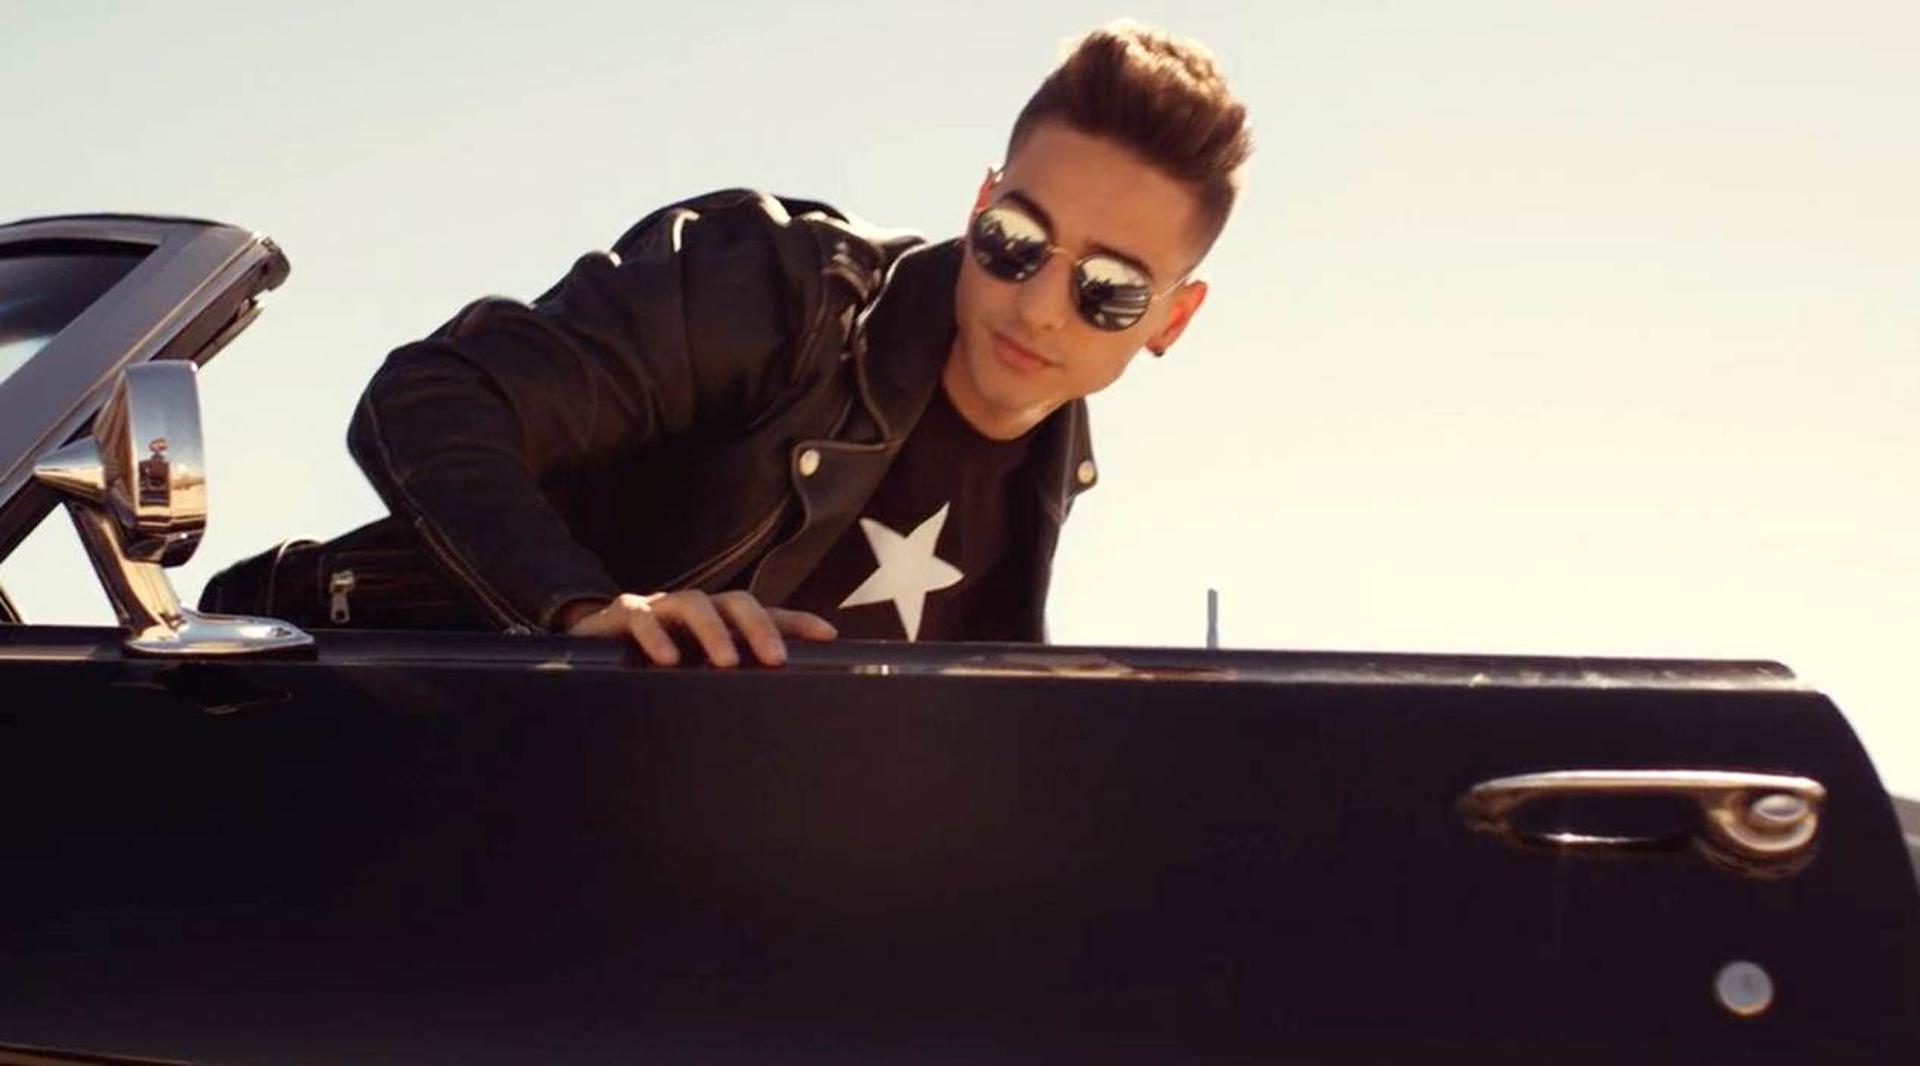 Download Nicky Jam Si Tú No Estás Wallpaper Images Free - Directory ...